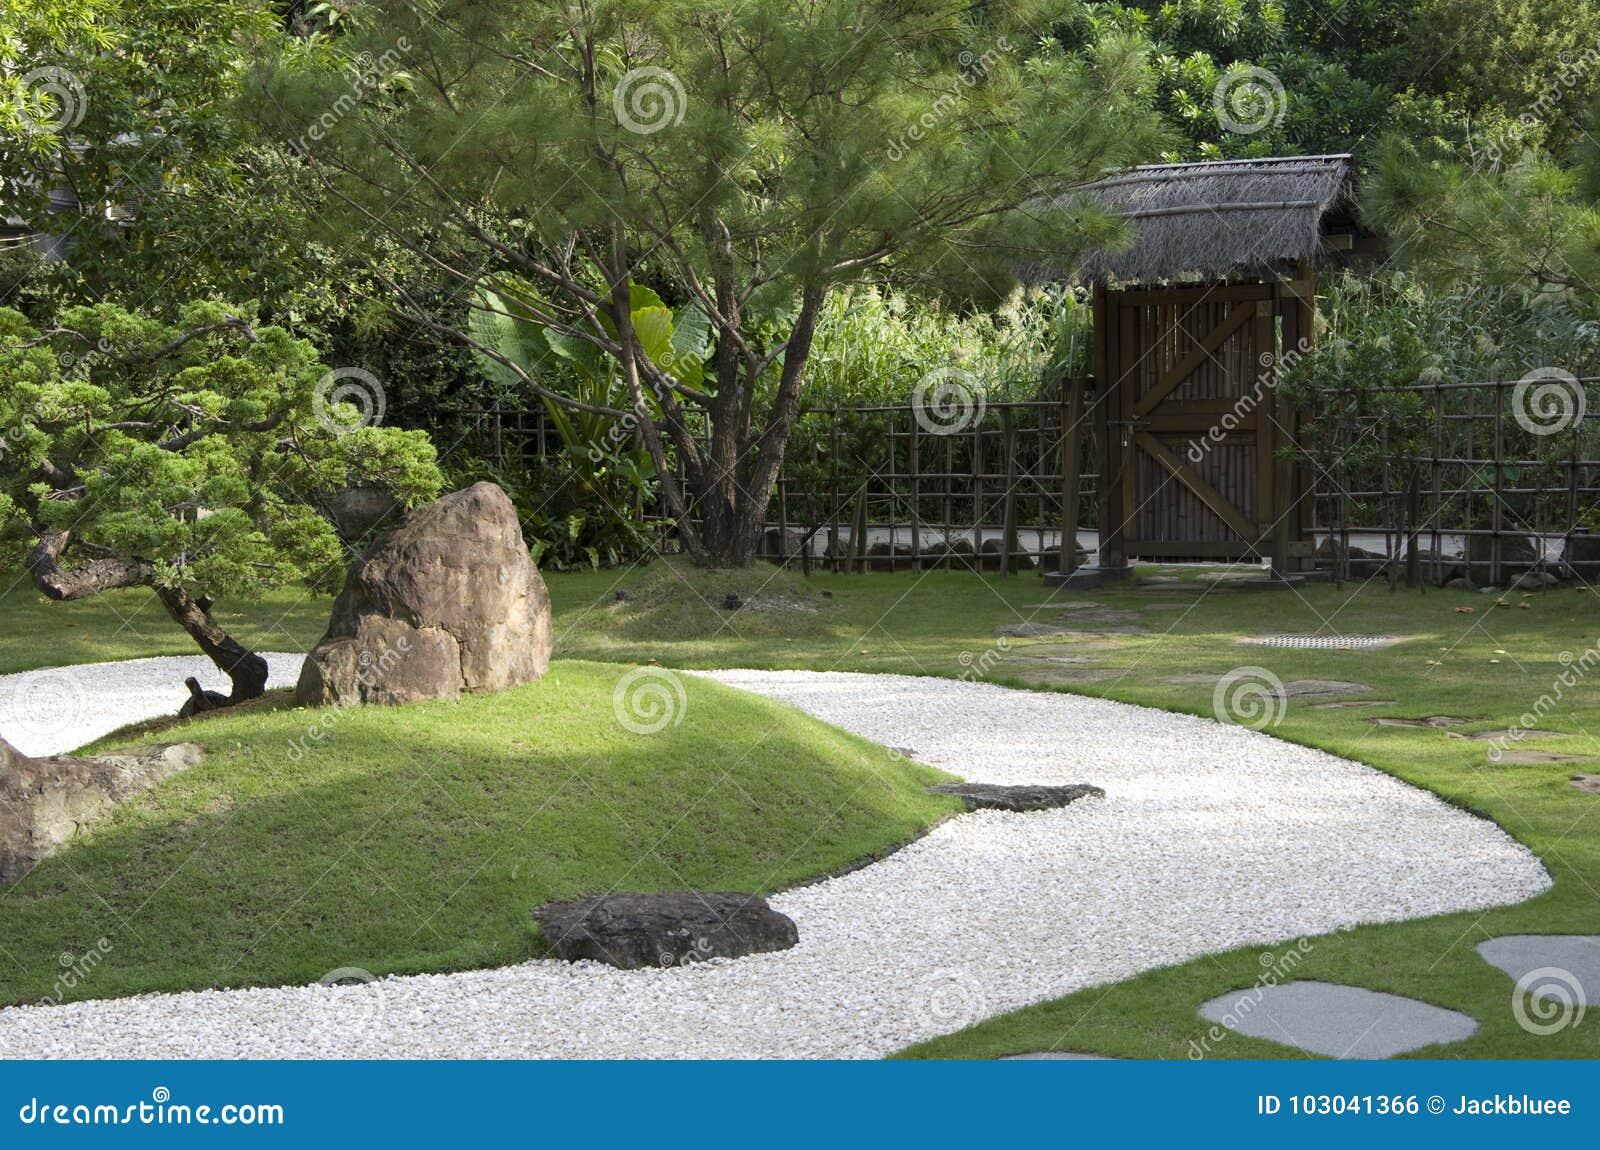 Sand For Backyard japanese zen garden with sand backyard stock photo - image of